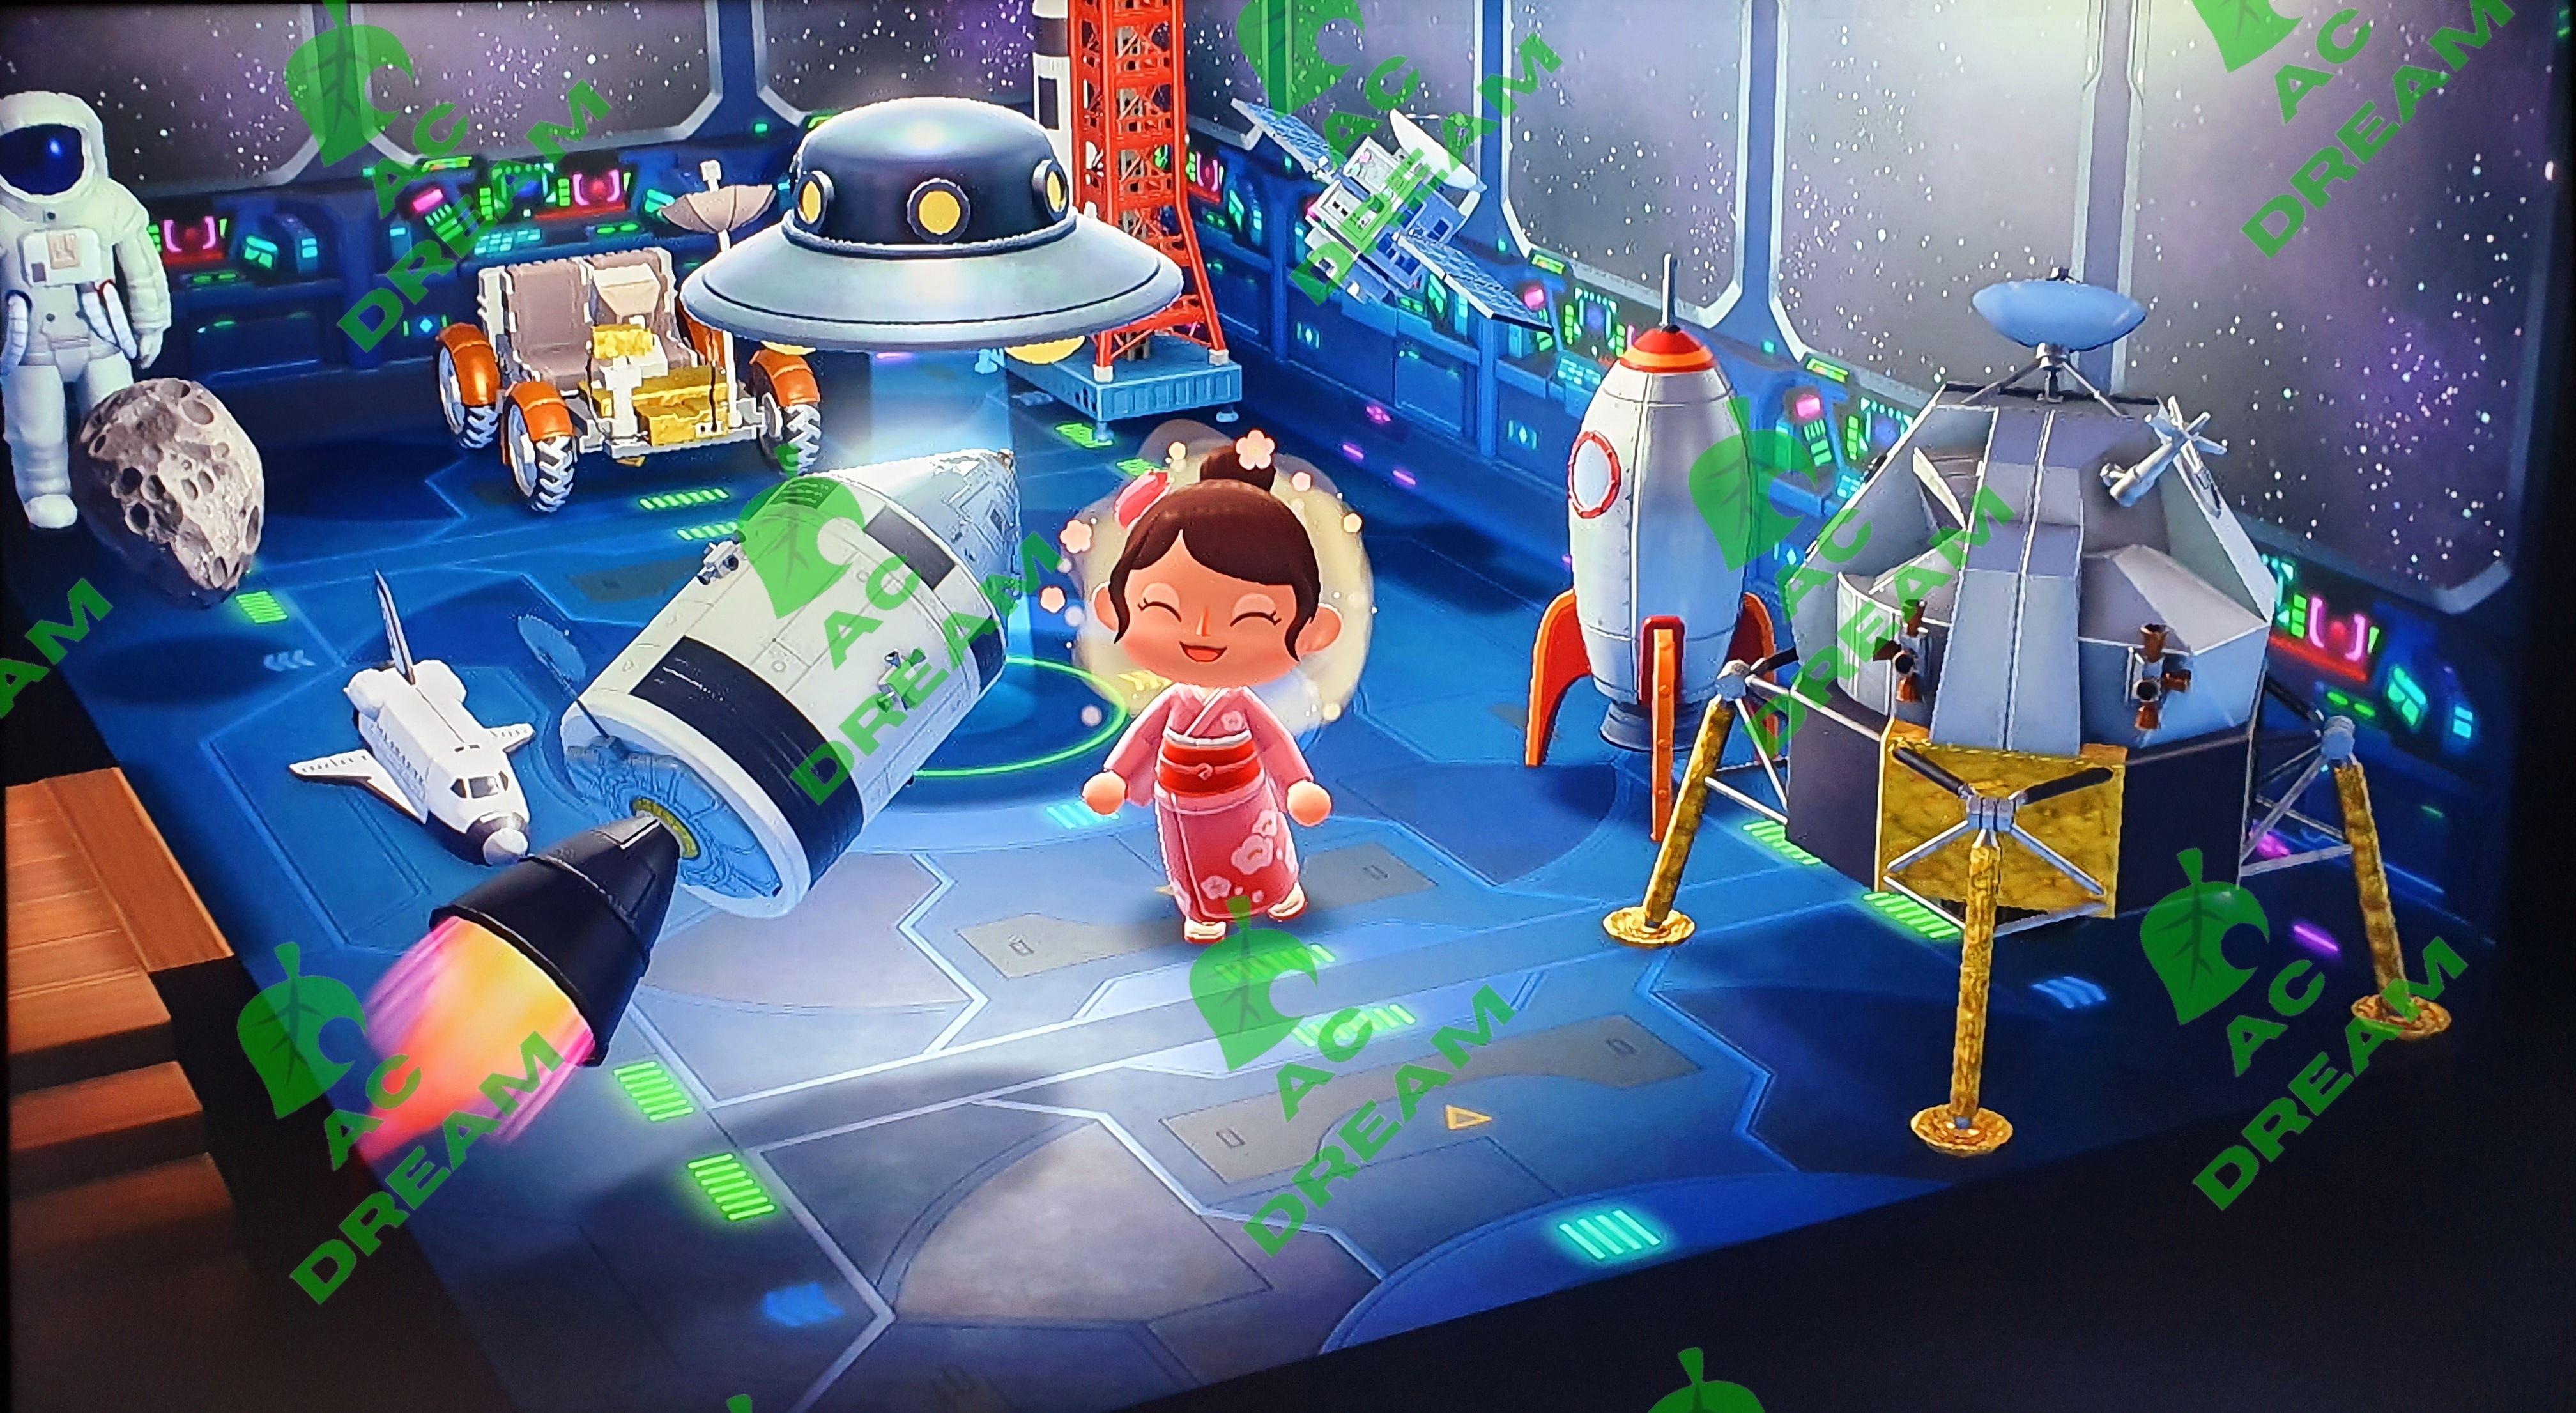 Space Room In Animal Crossing Enjoy To Design Your Own Room Space Animals Animal Crossing New Animal Crossing